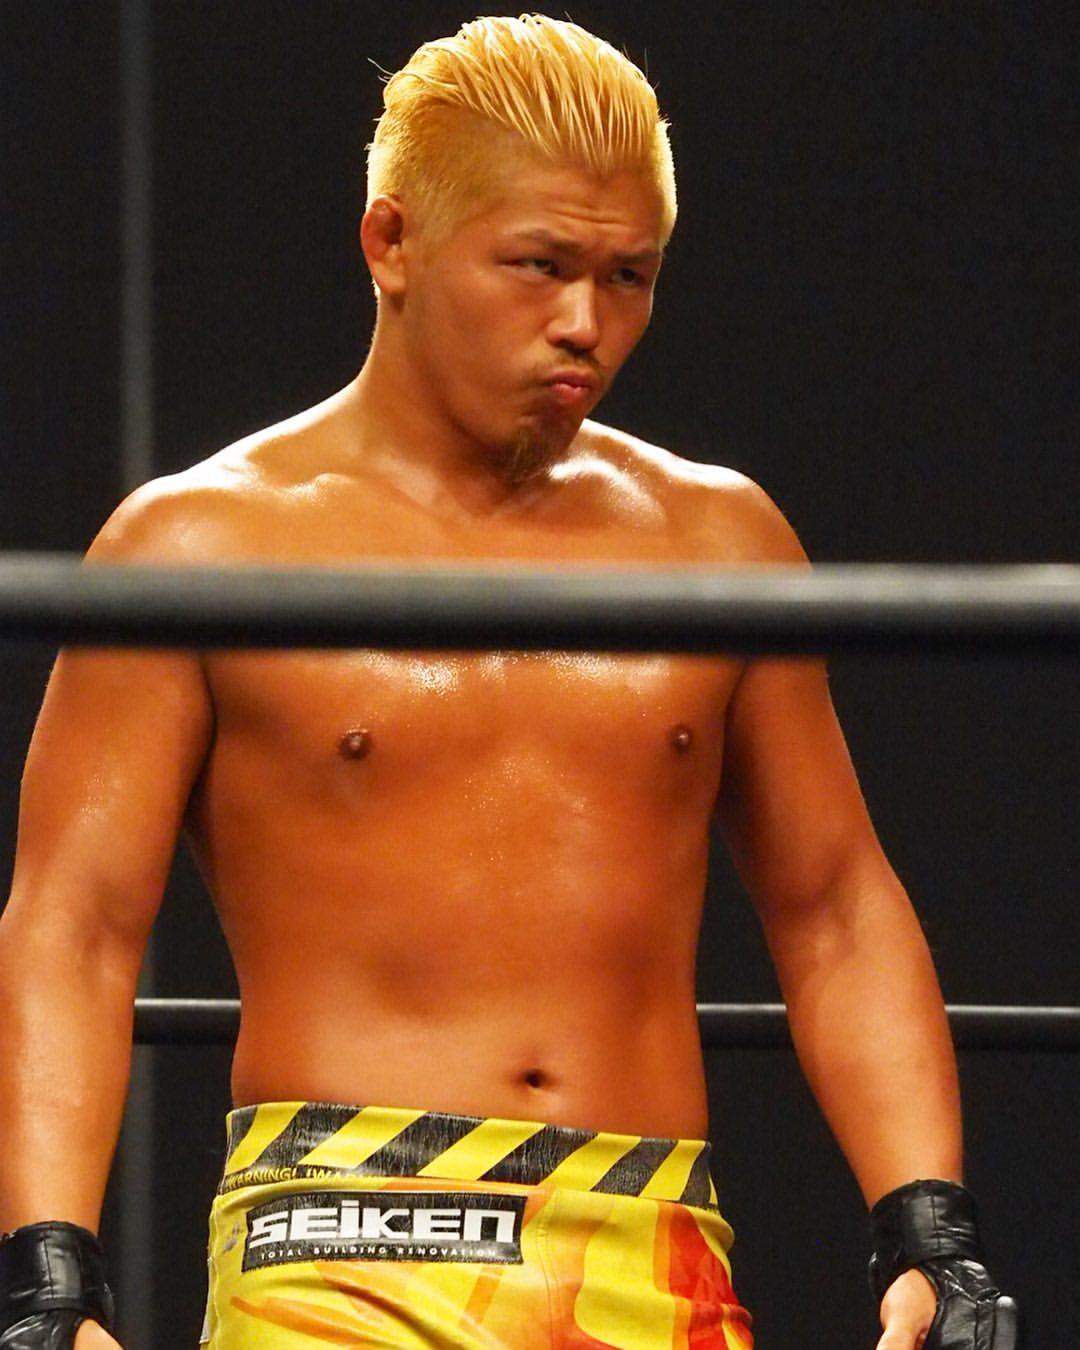 Keisuke Okuda